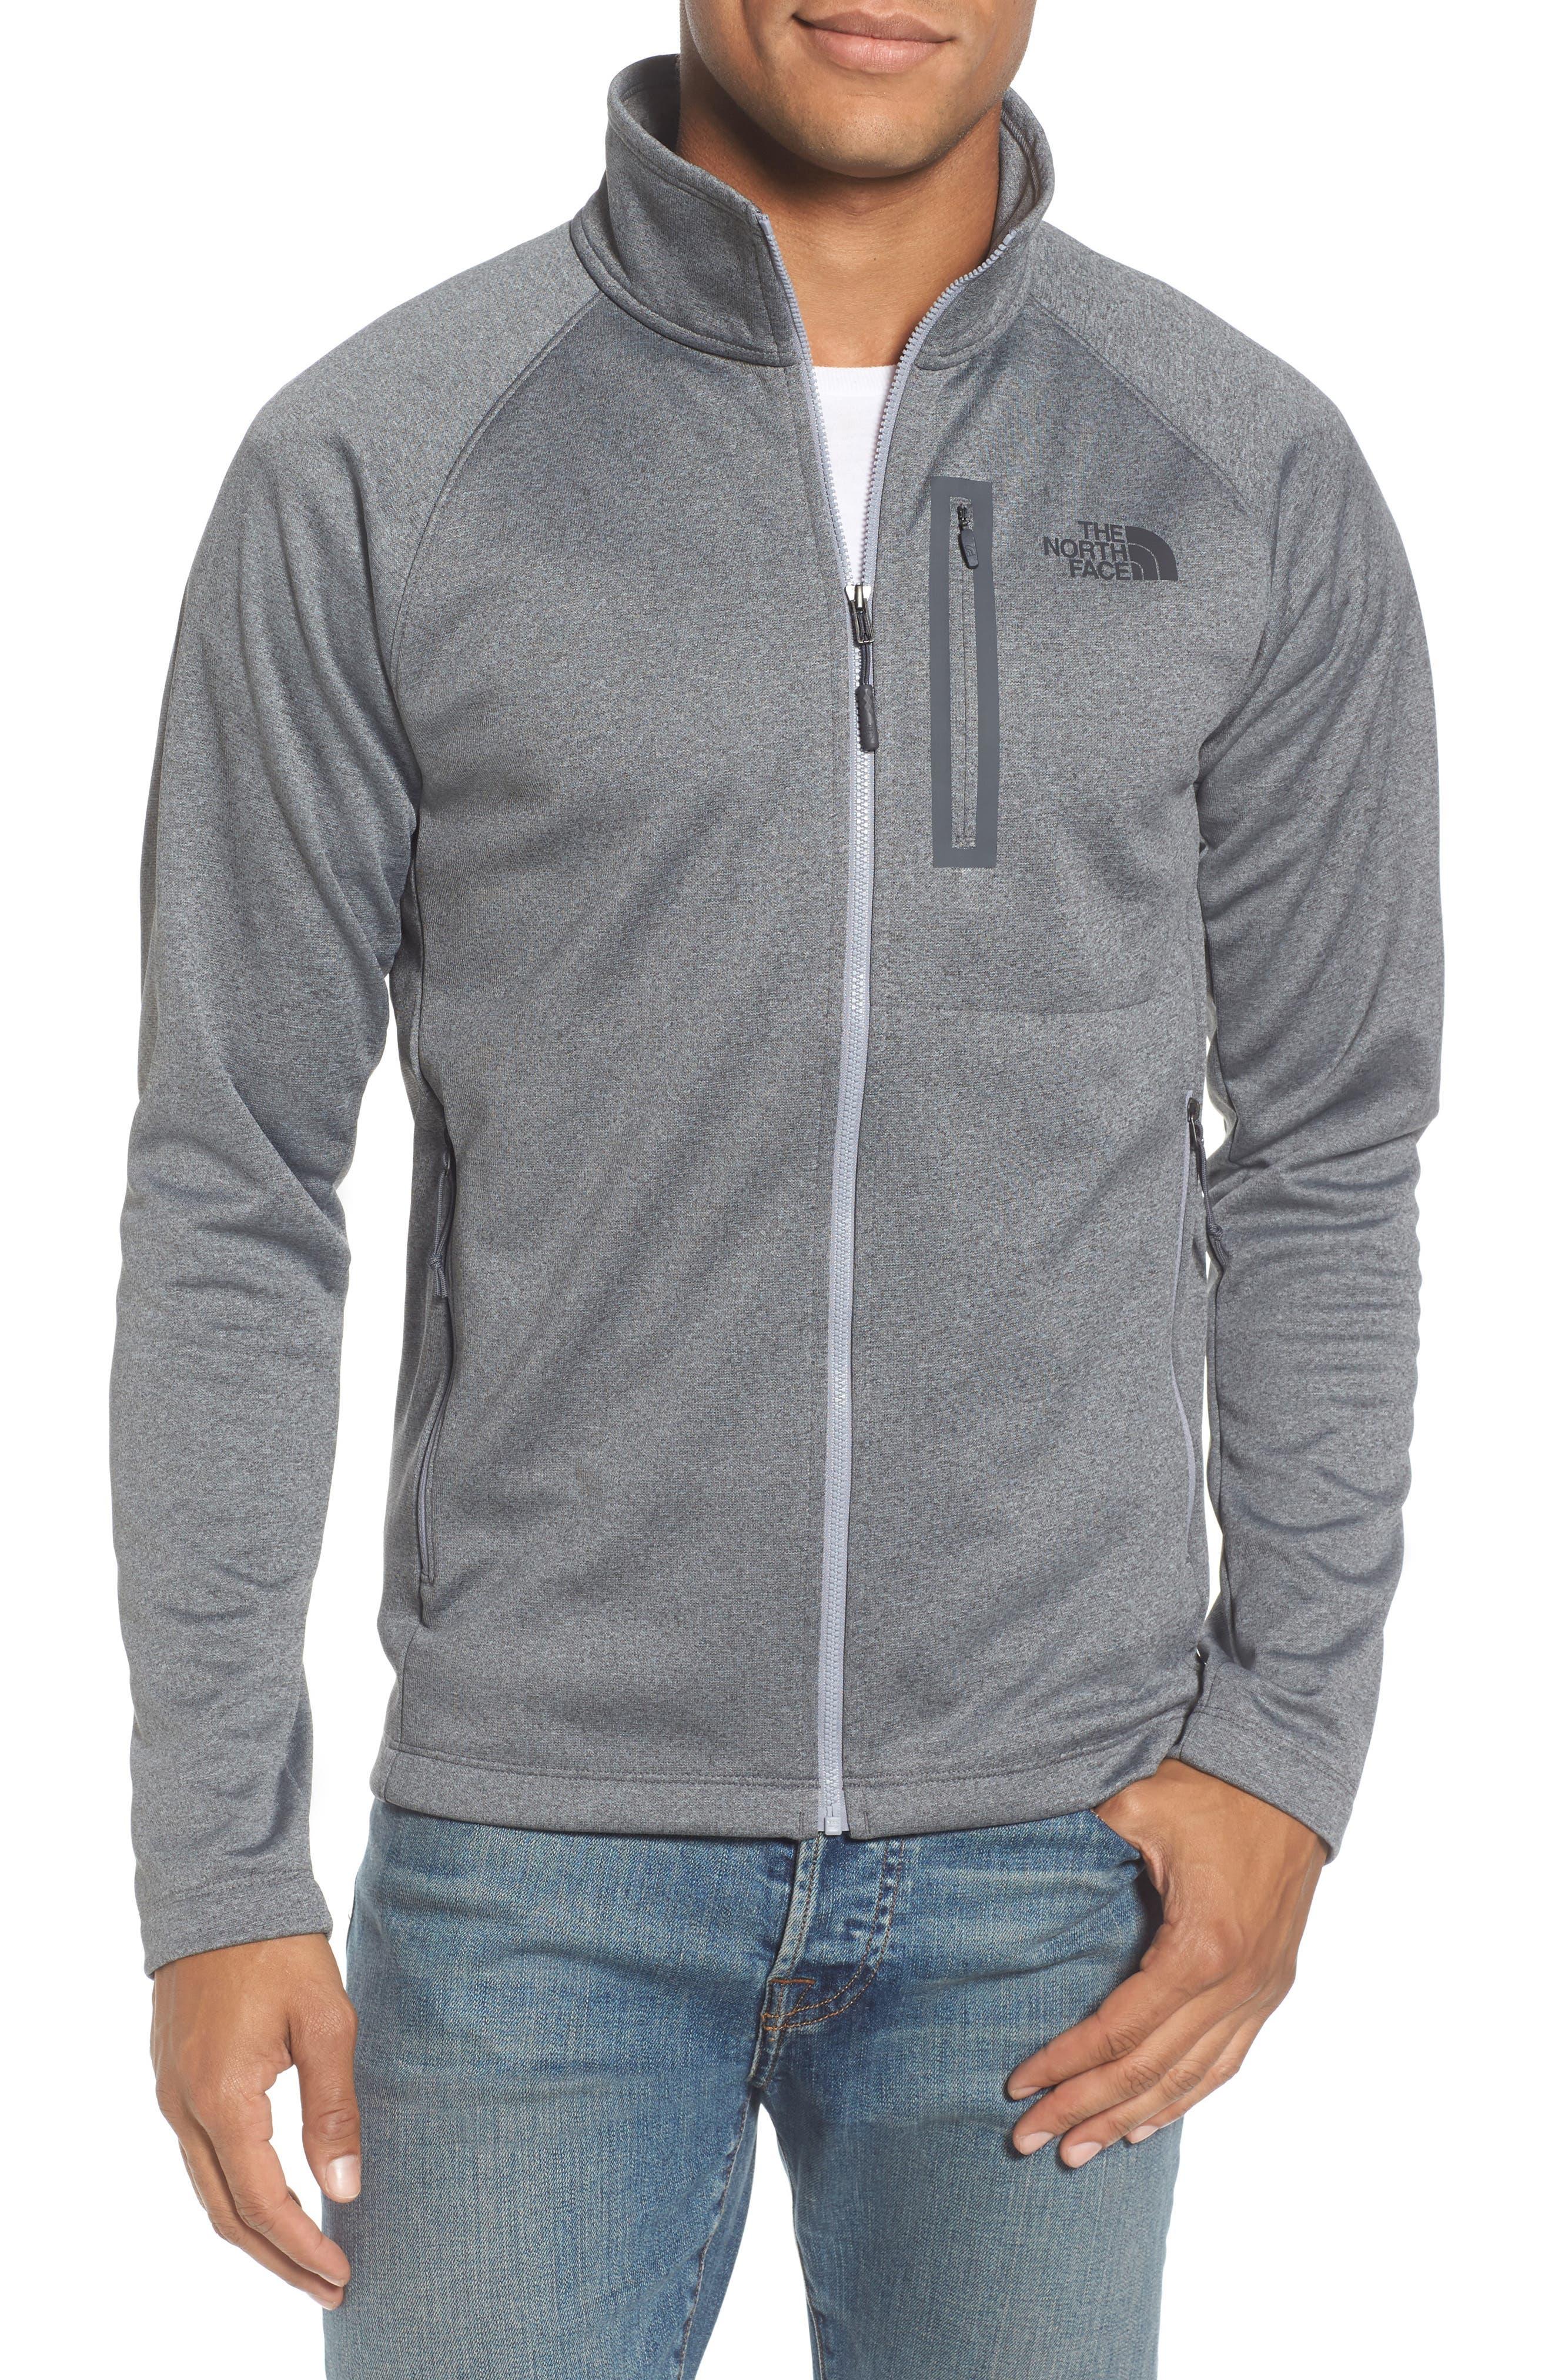 'Canyonlands' Jacket,                         Main,                         color, Tnf Medium Grey Heather